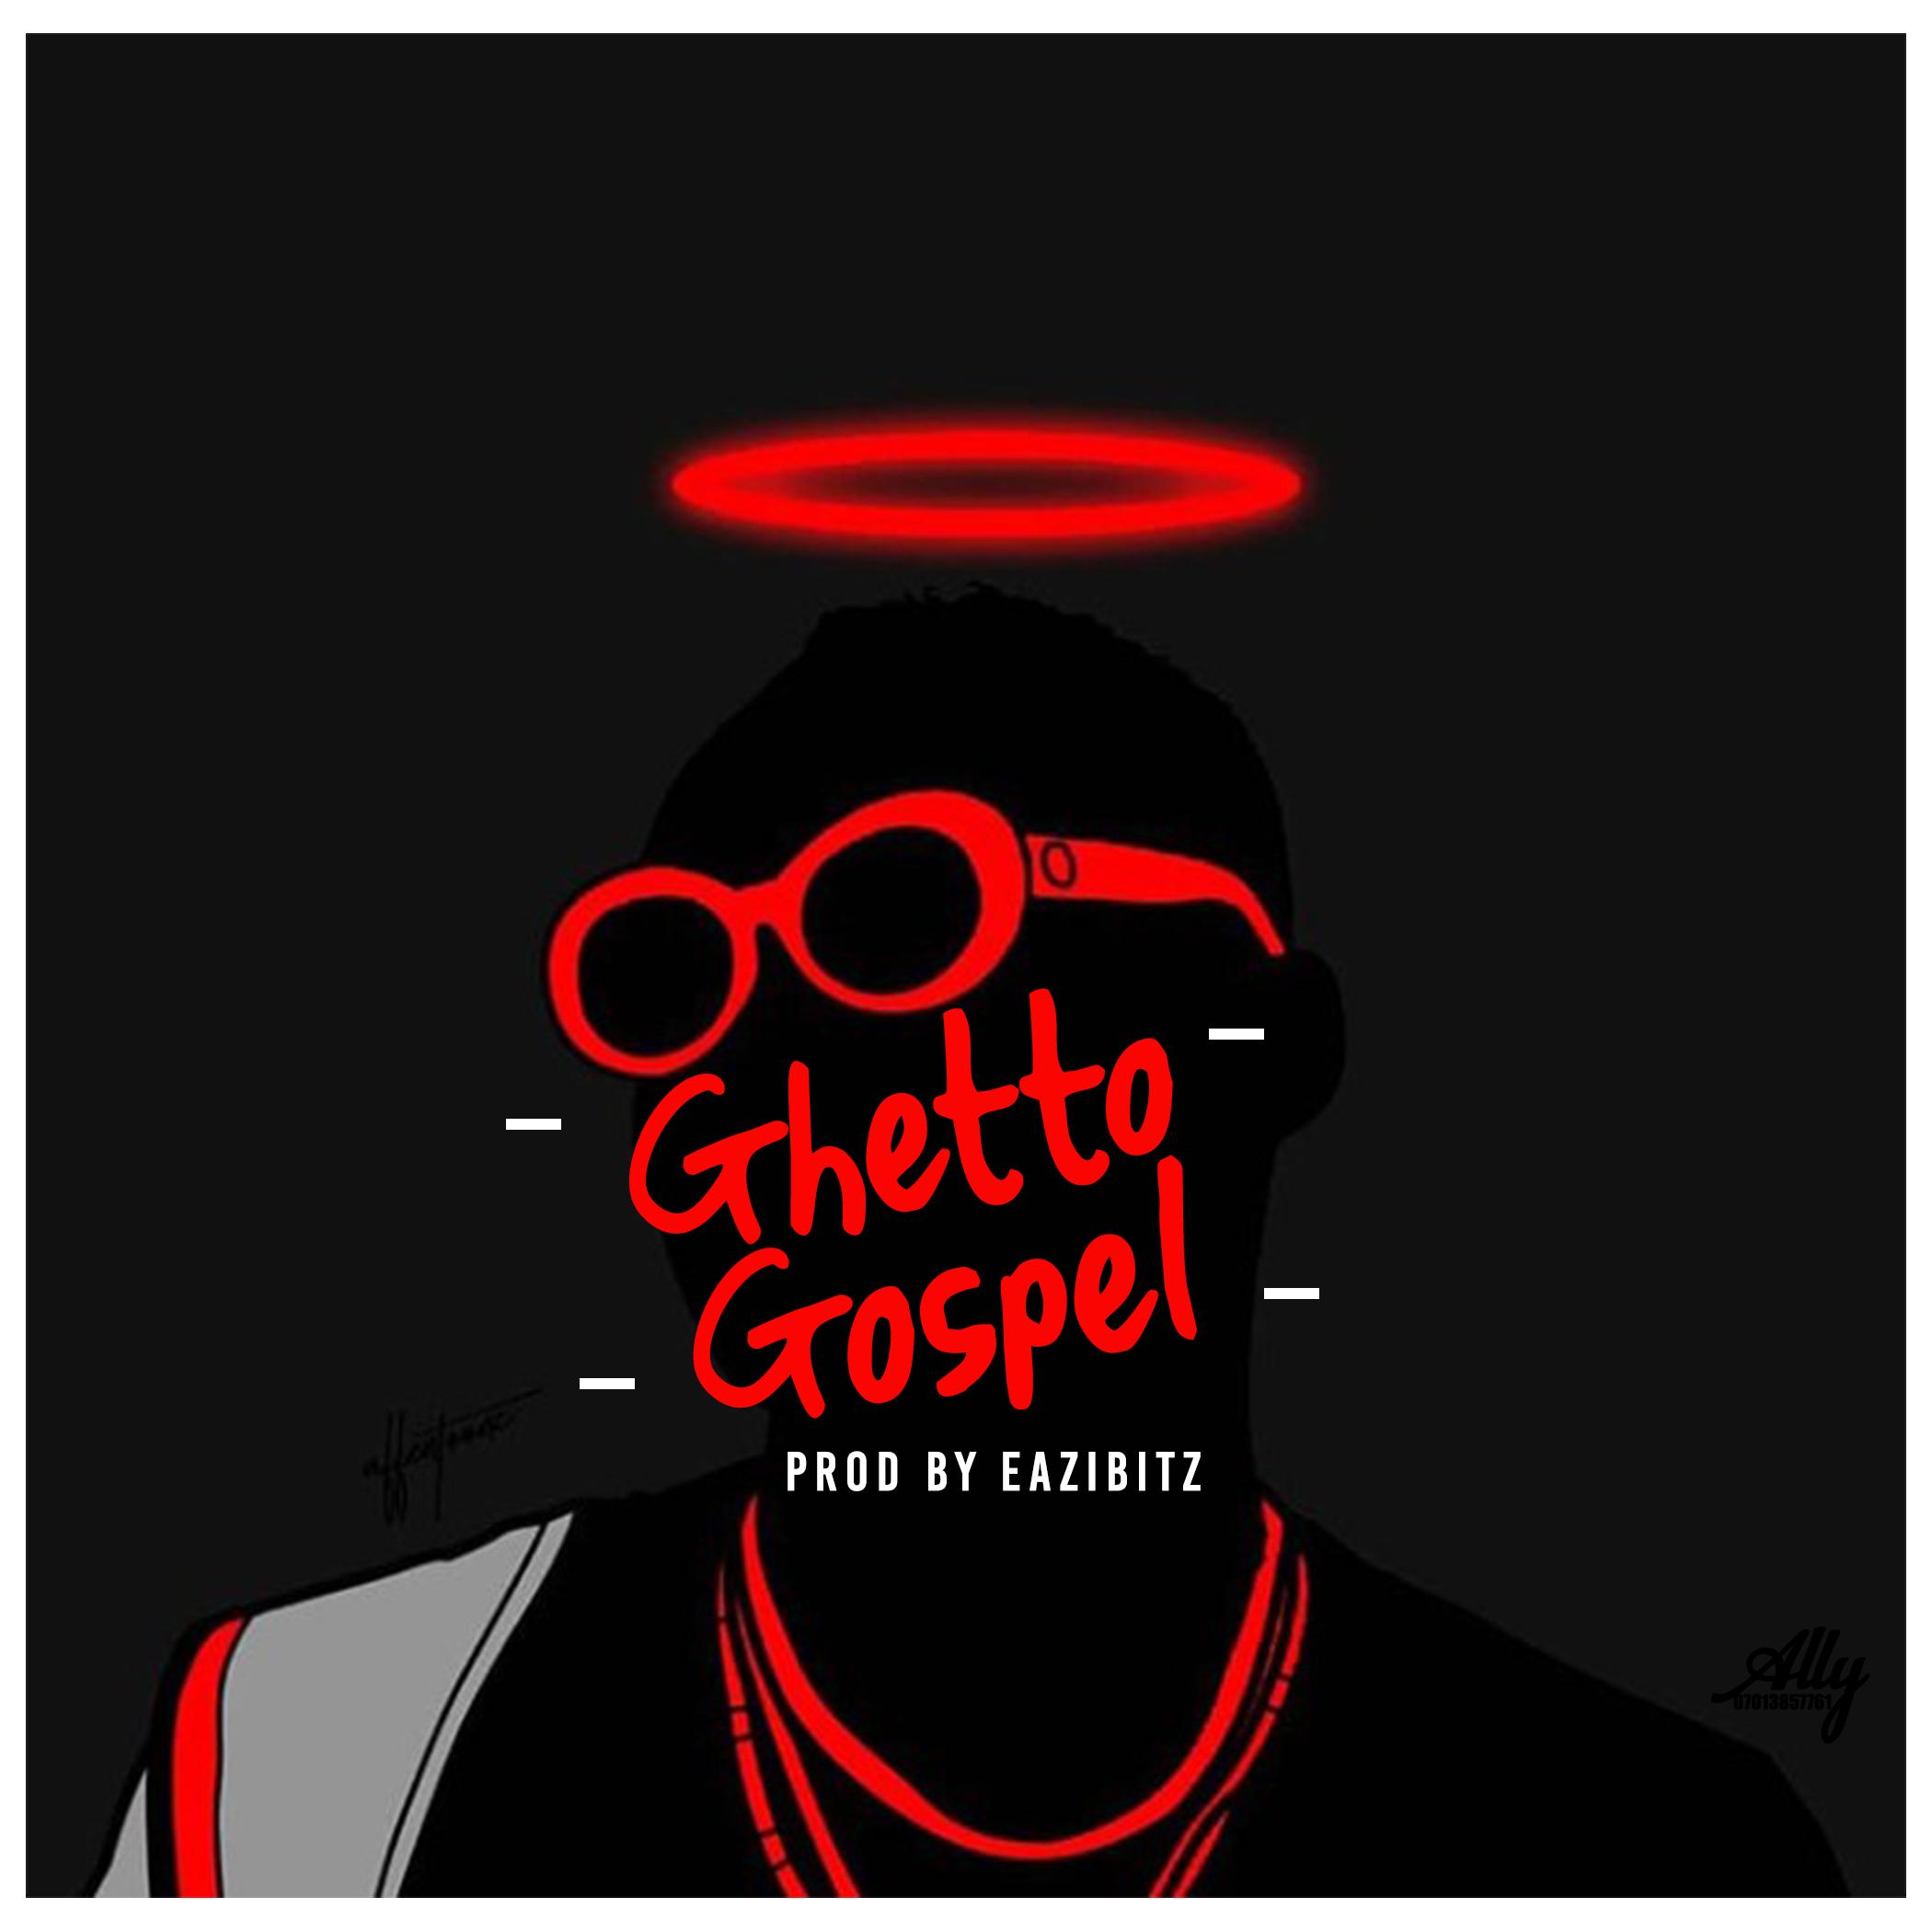 Download Freebeat:- Ghetto Gospel (Prod By Eazibitz) - 9jaflaver